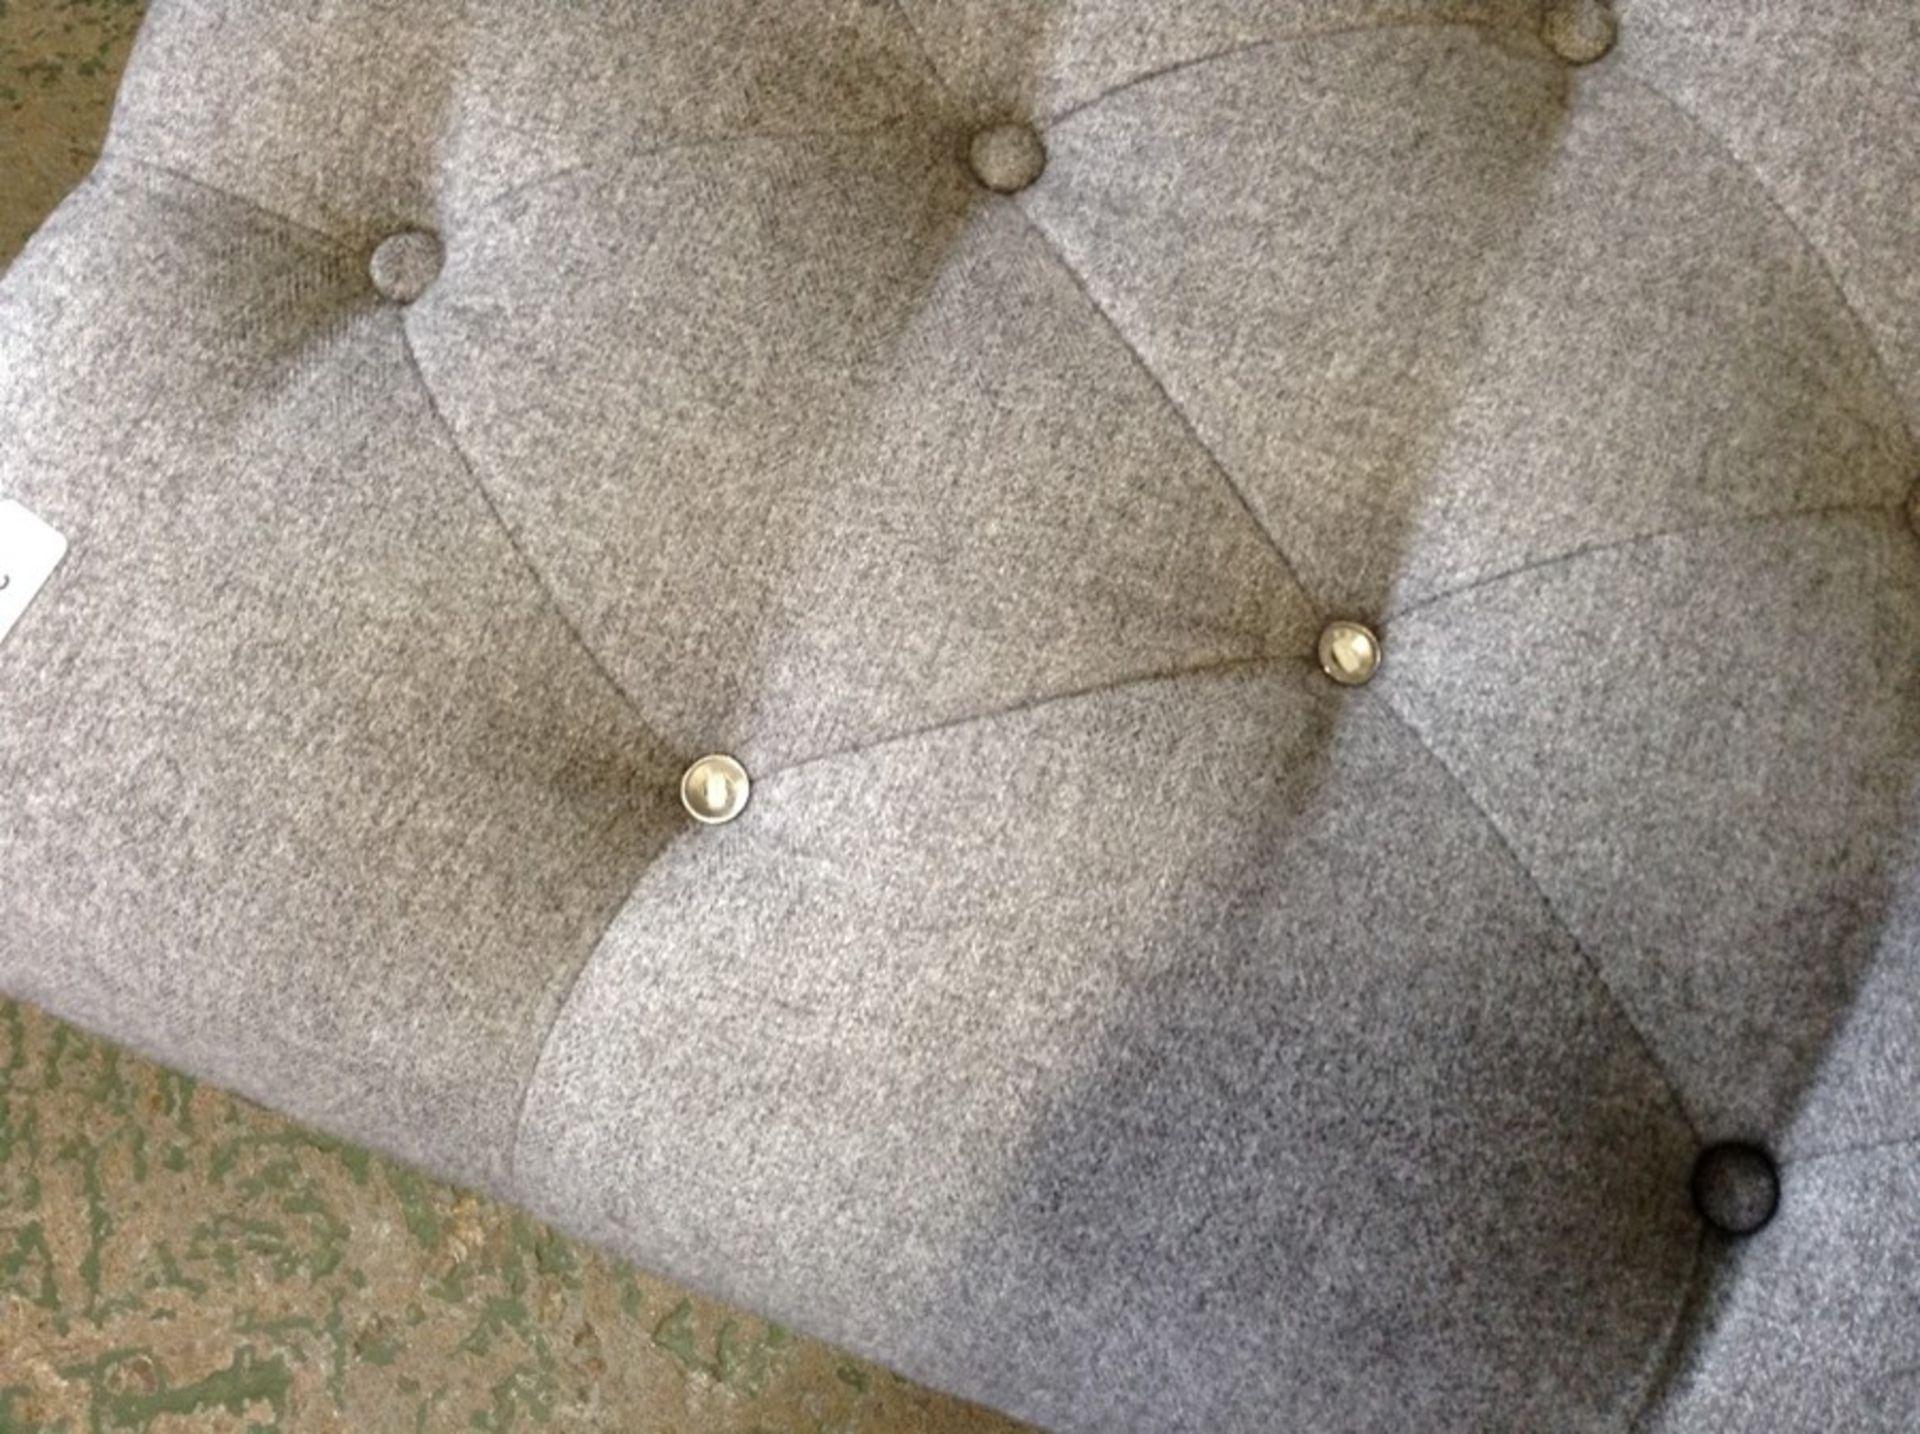 GREY FABRIC BENCH STOOL TR002161 W00794661 (MISSING BU - Image 2 of 3